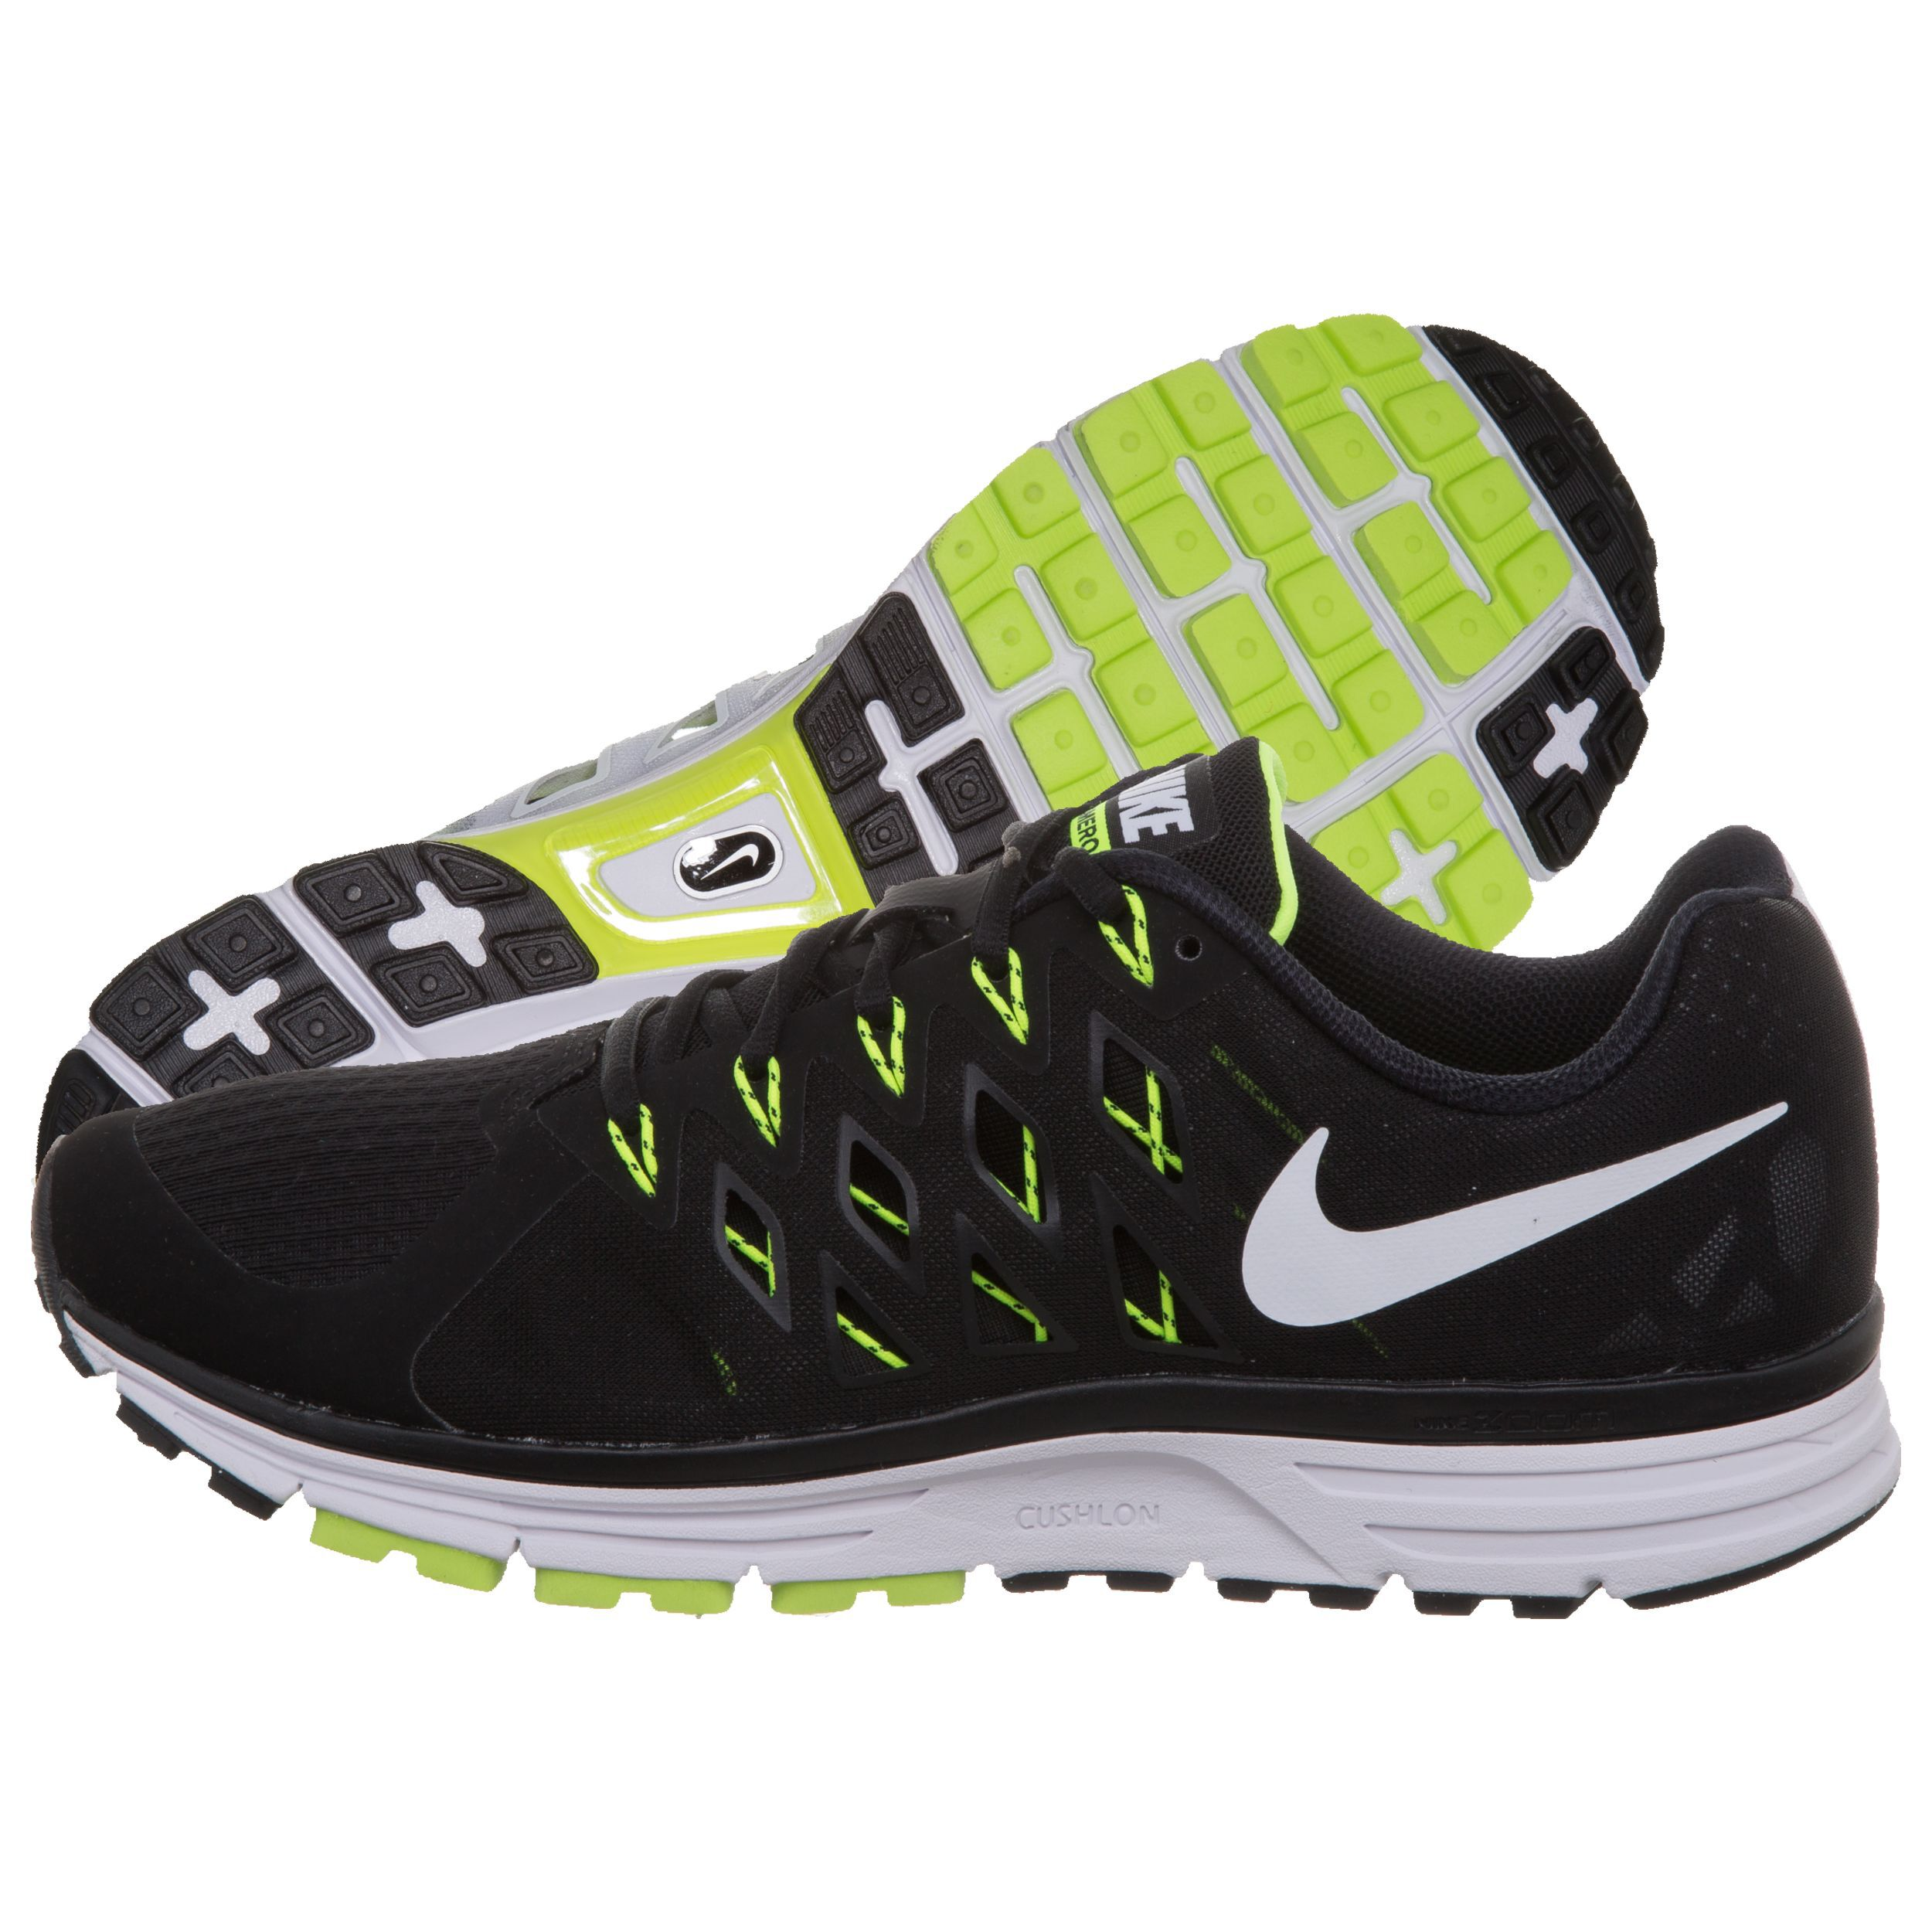 buy Nike Zoom Vomero 9 Neutral Running